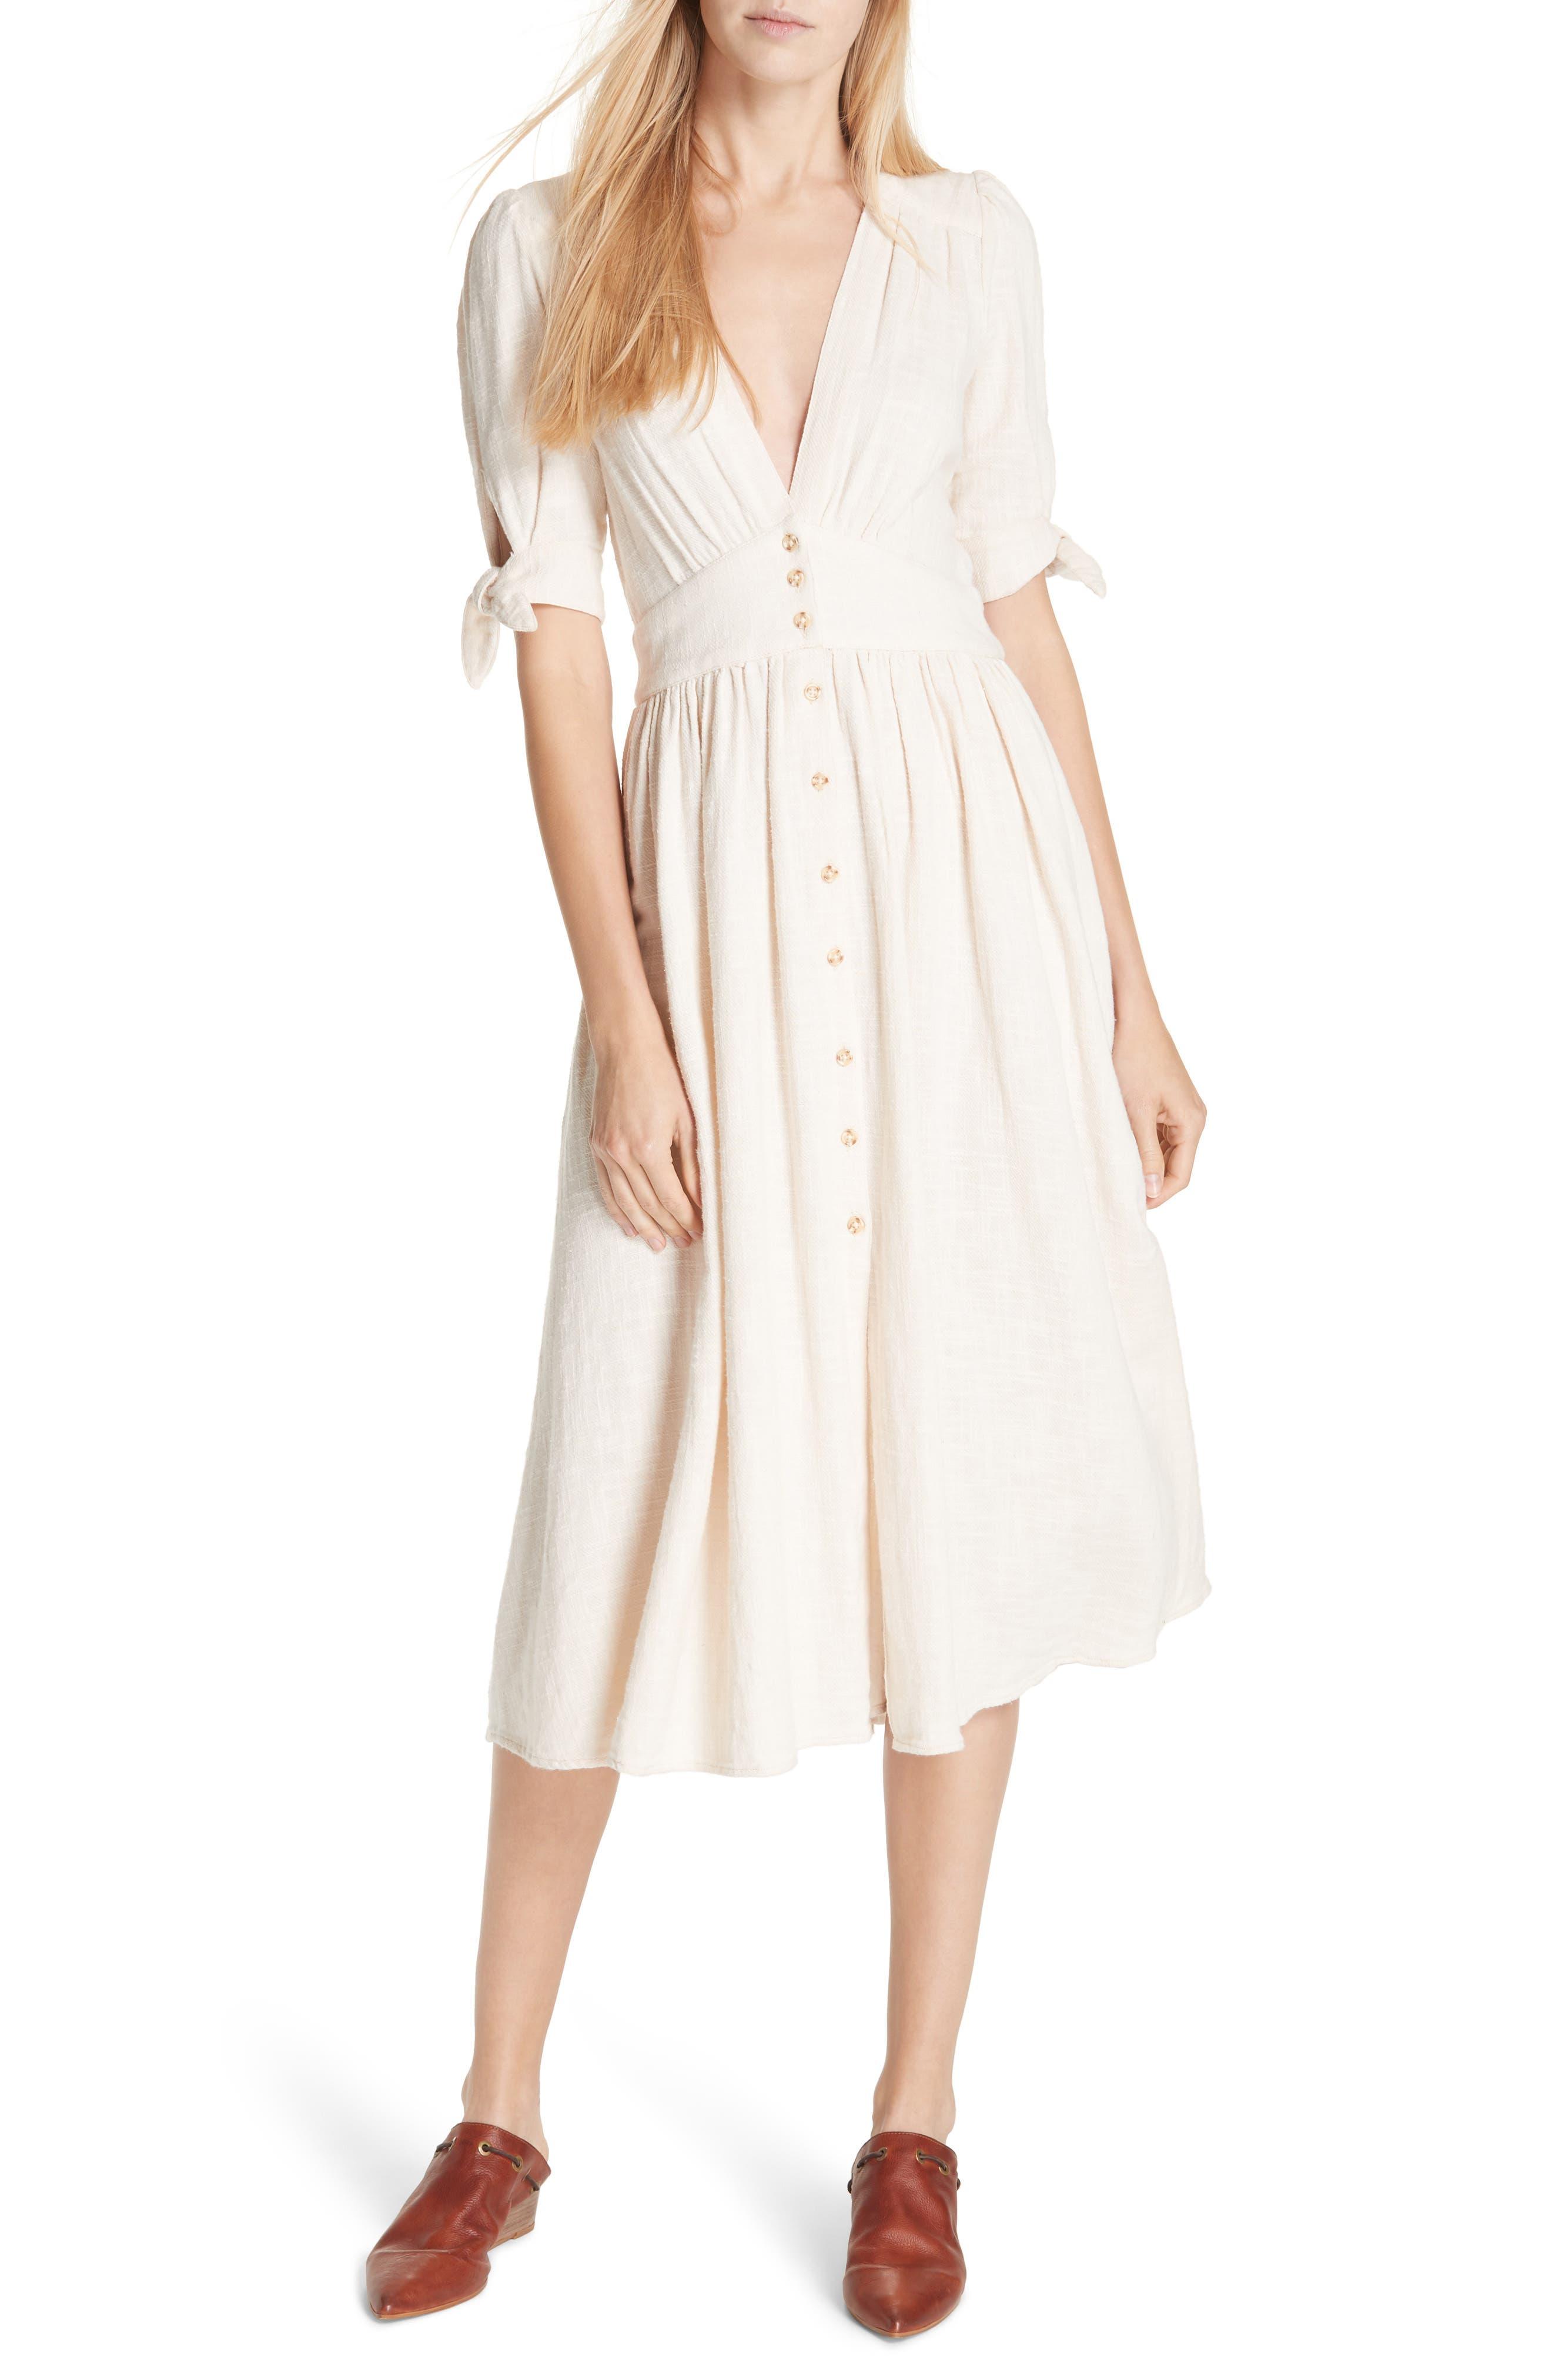 Free People Love Of My Life Midi Dress, Ivory